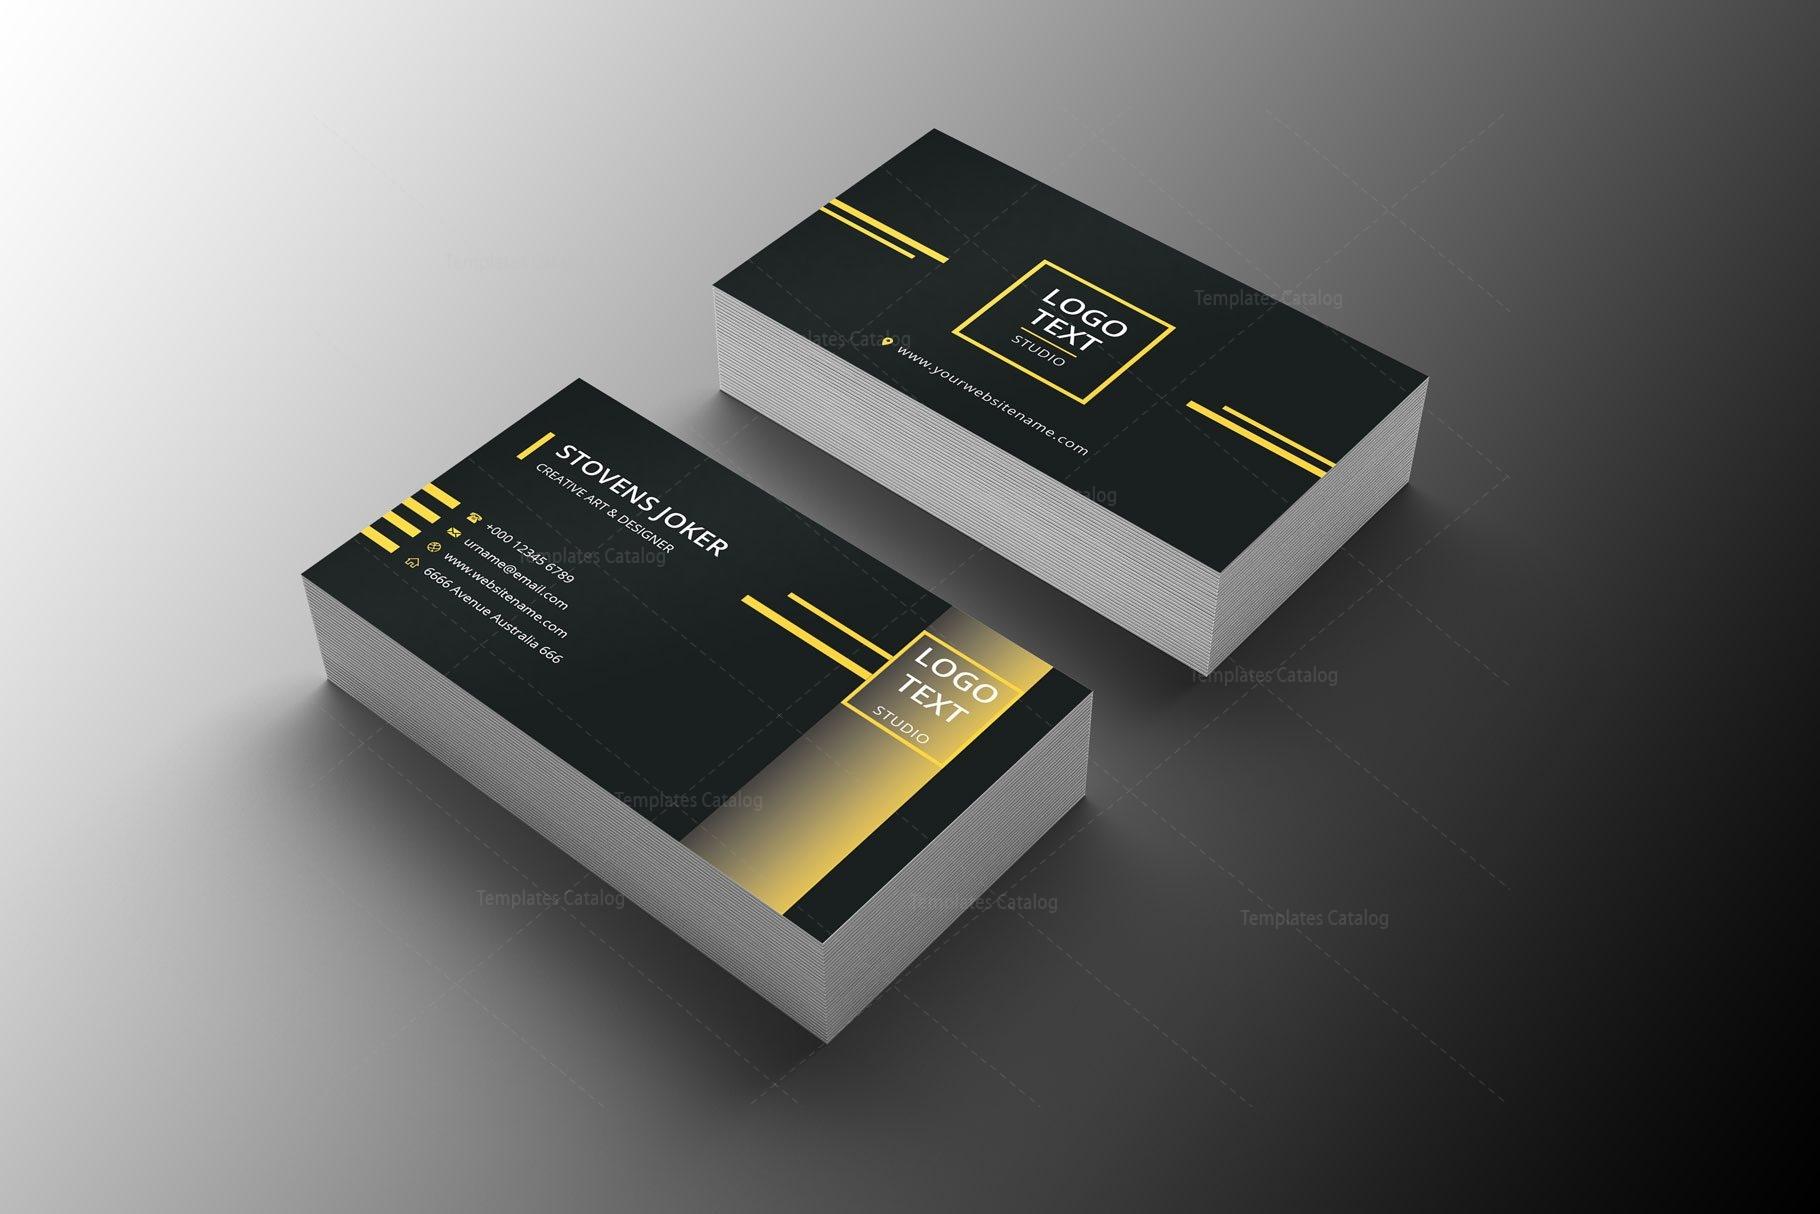 minimal programmer business card design 002246 template catalog